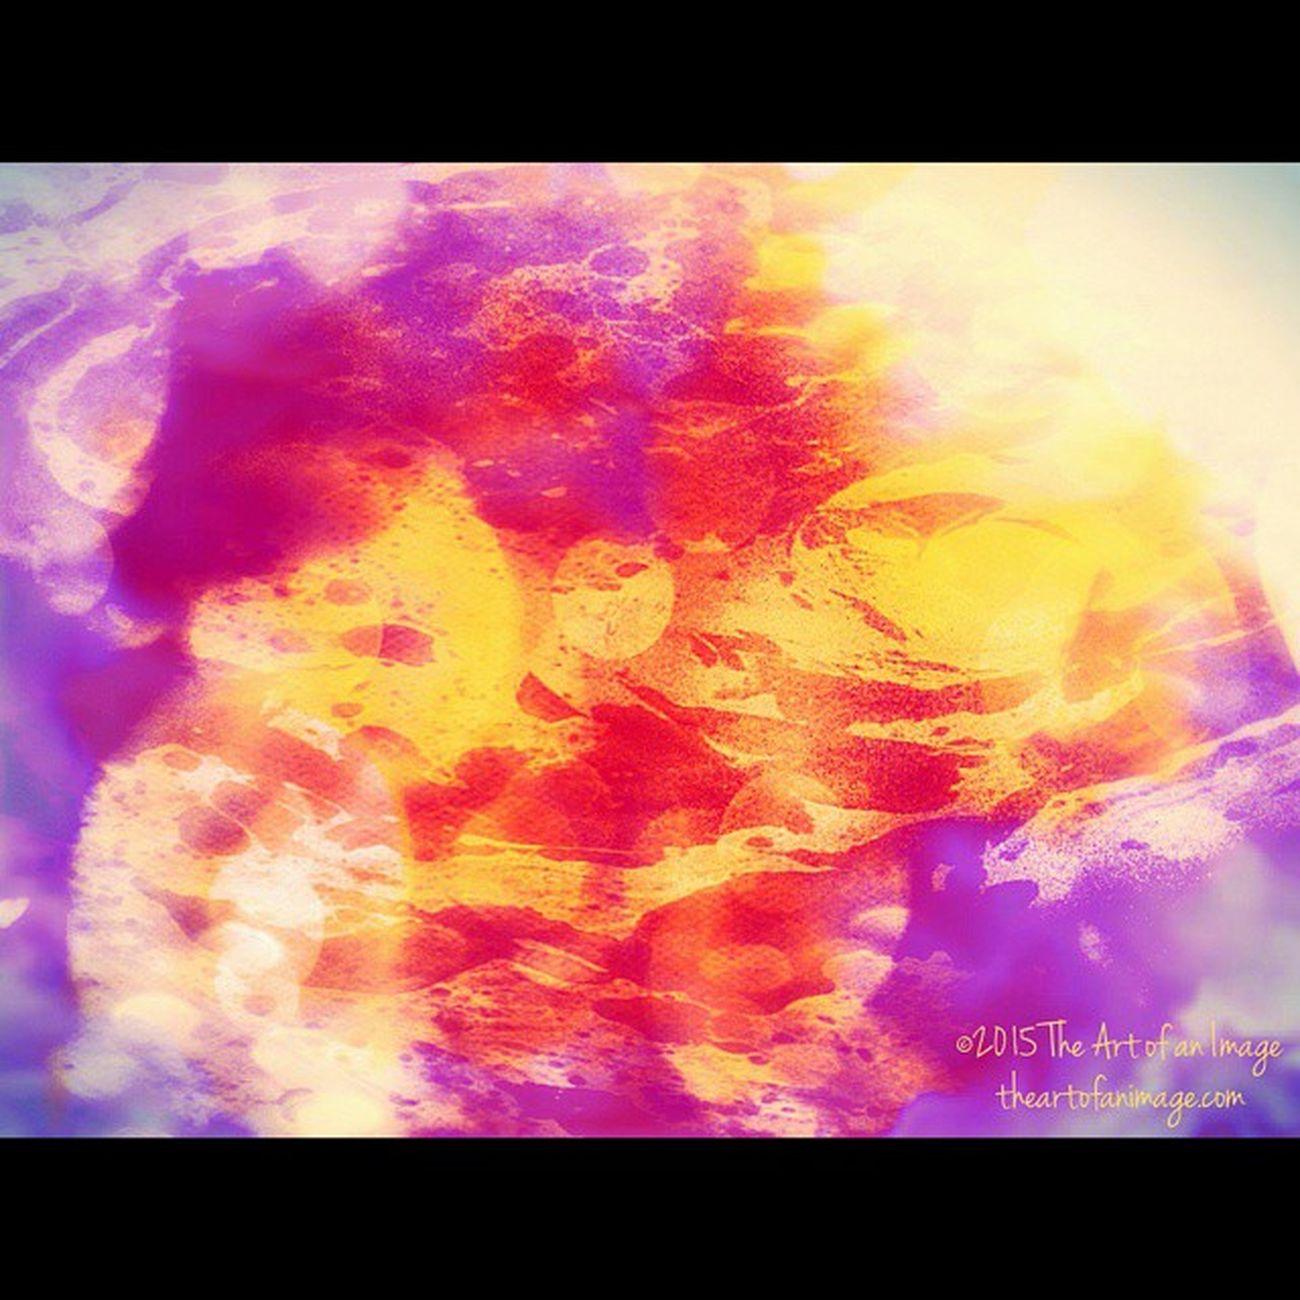 """Chemical Spill"" April 2015 ☮ www.theartofanimage.com"